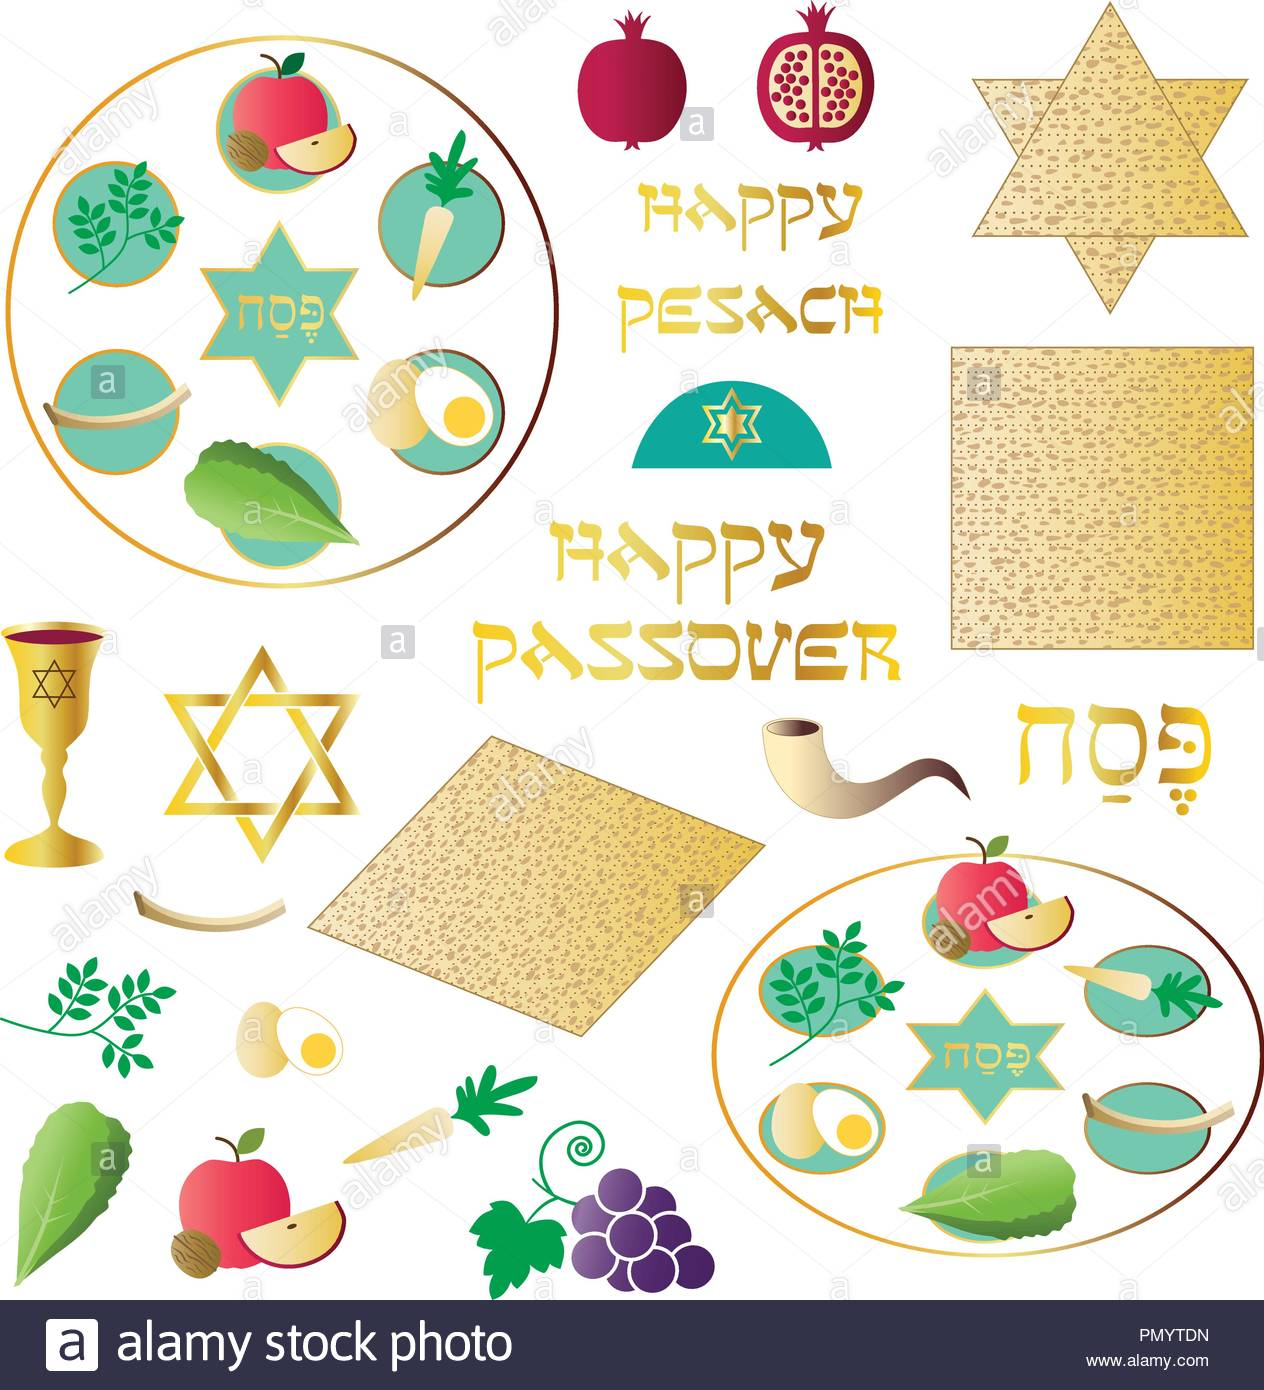 passover seder motifs - Stock Image